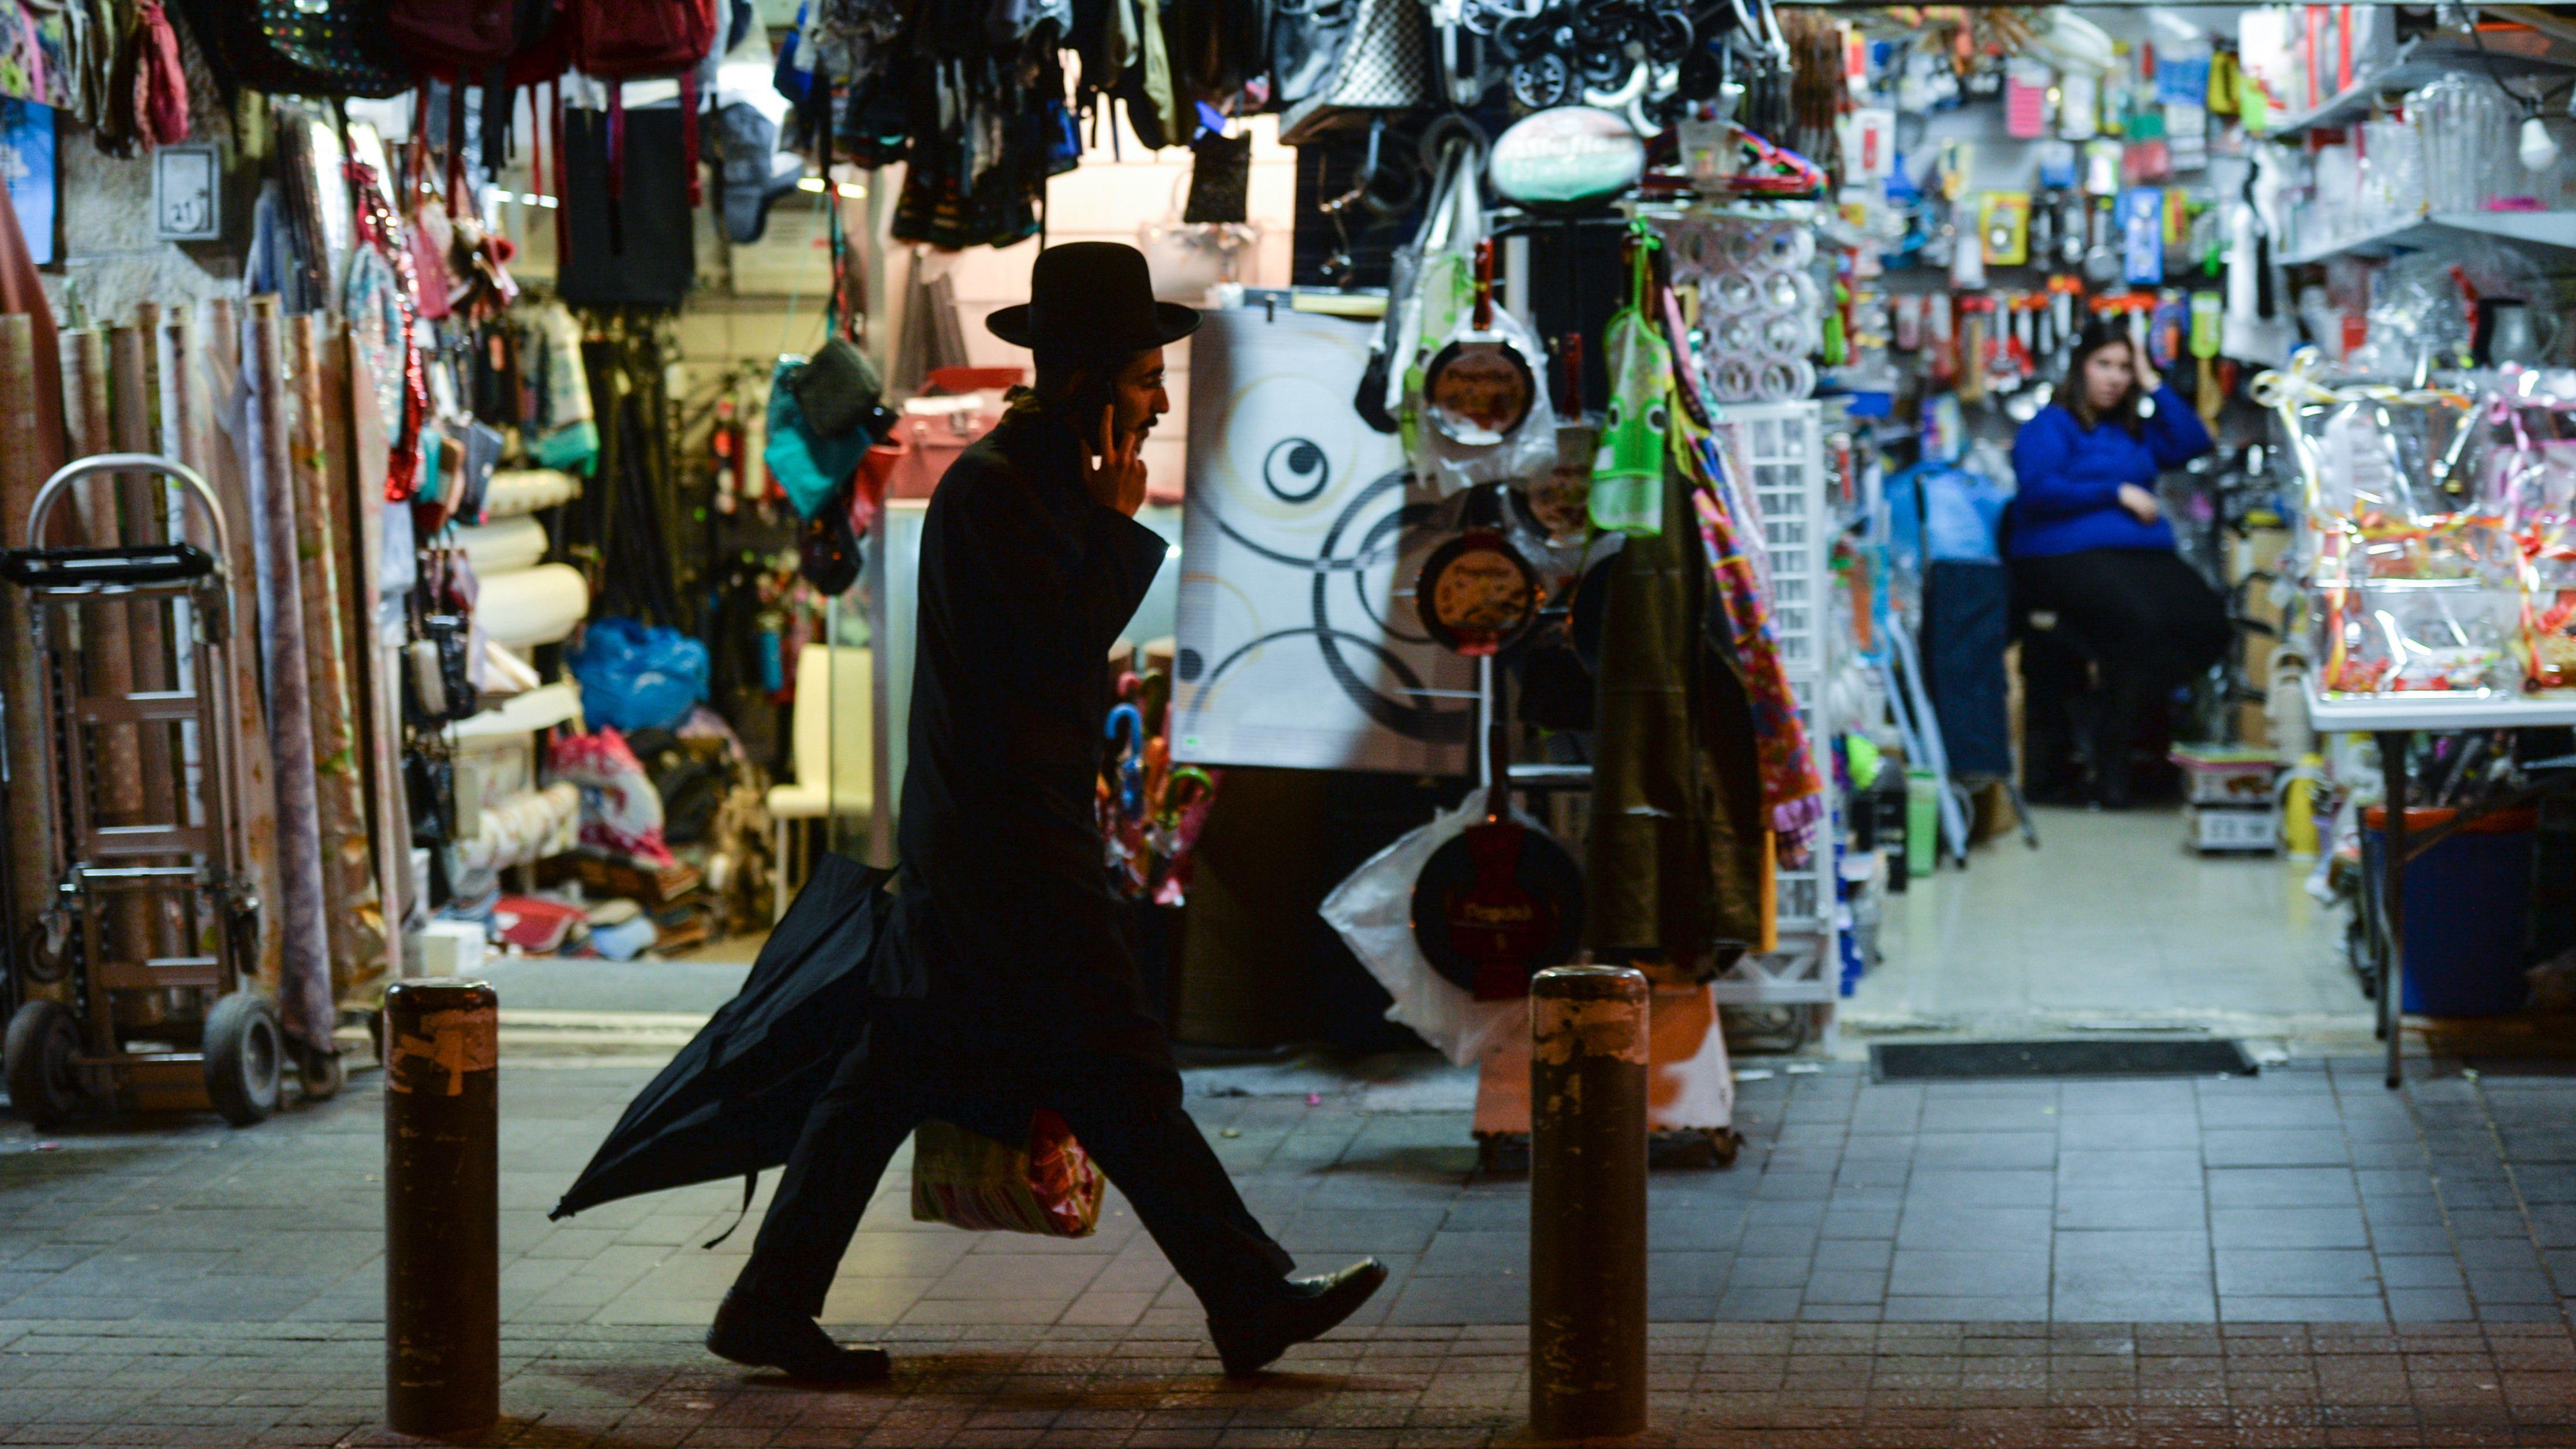 Straßenszene in Israel